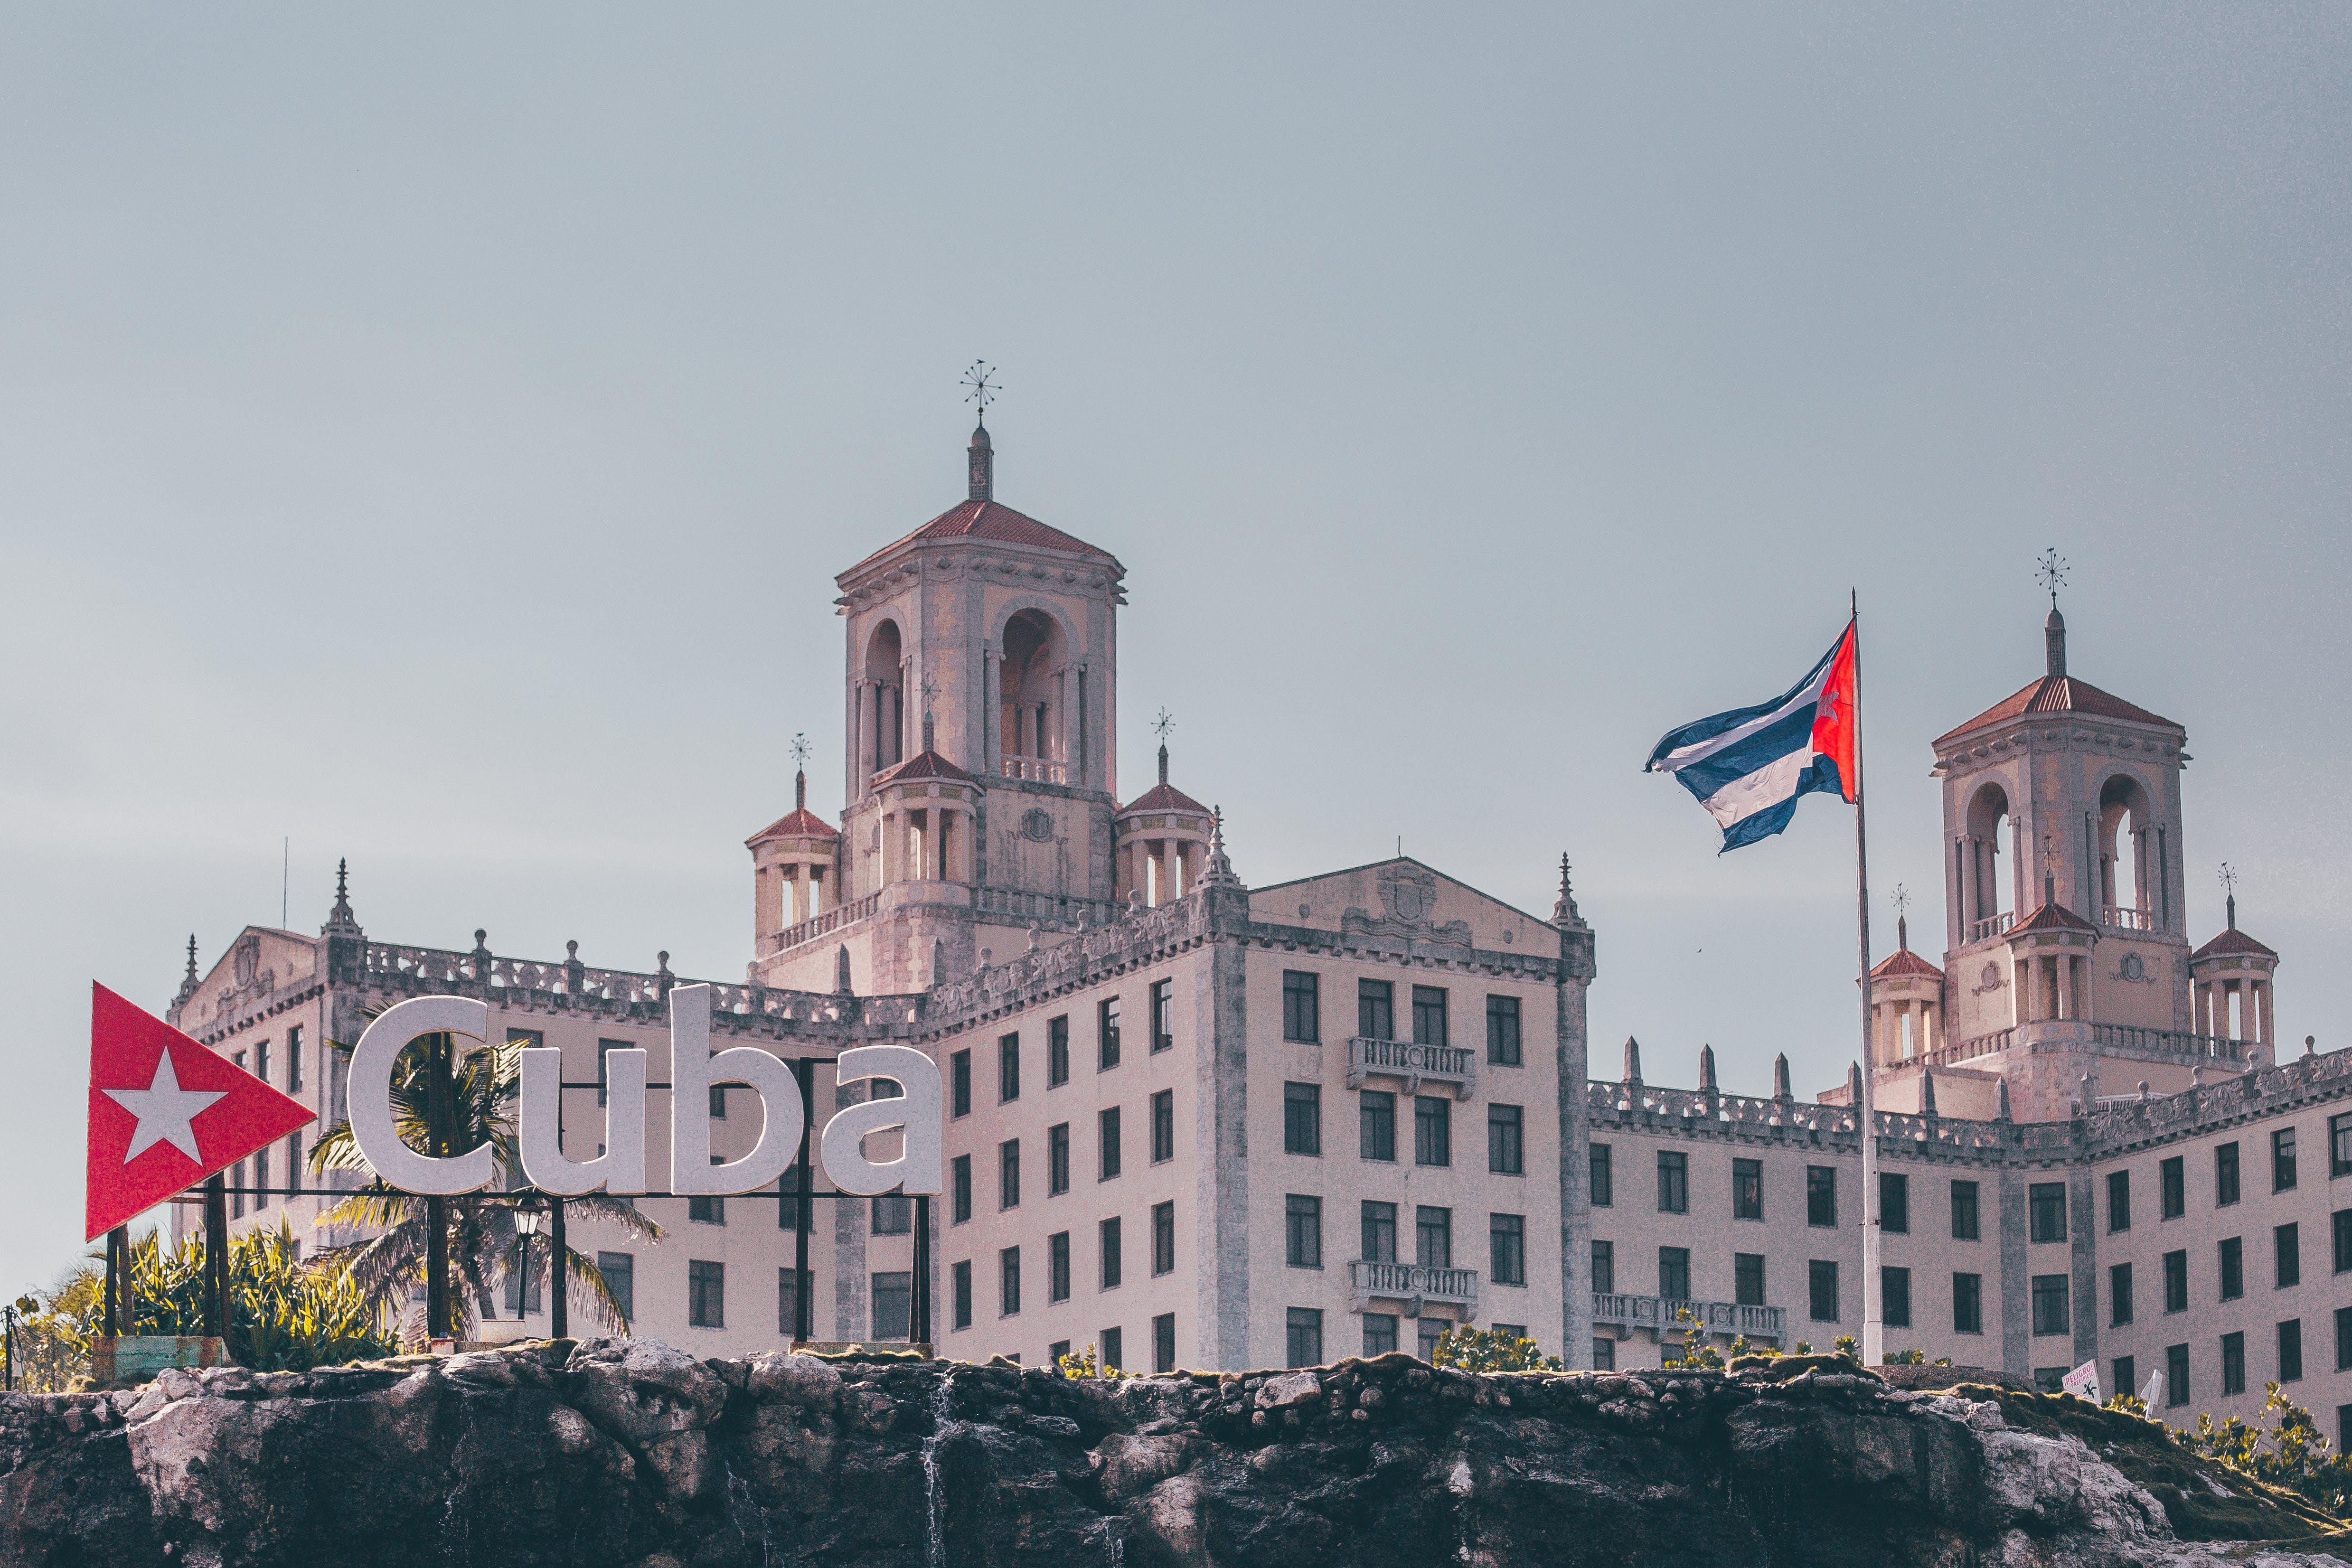 Fotos de stock gratuitas de administración, arquitectura, cielo, Cuba